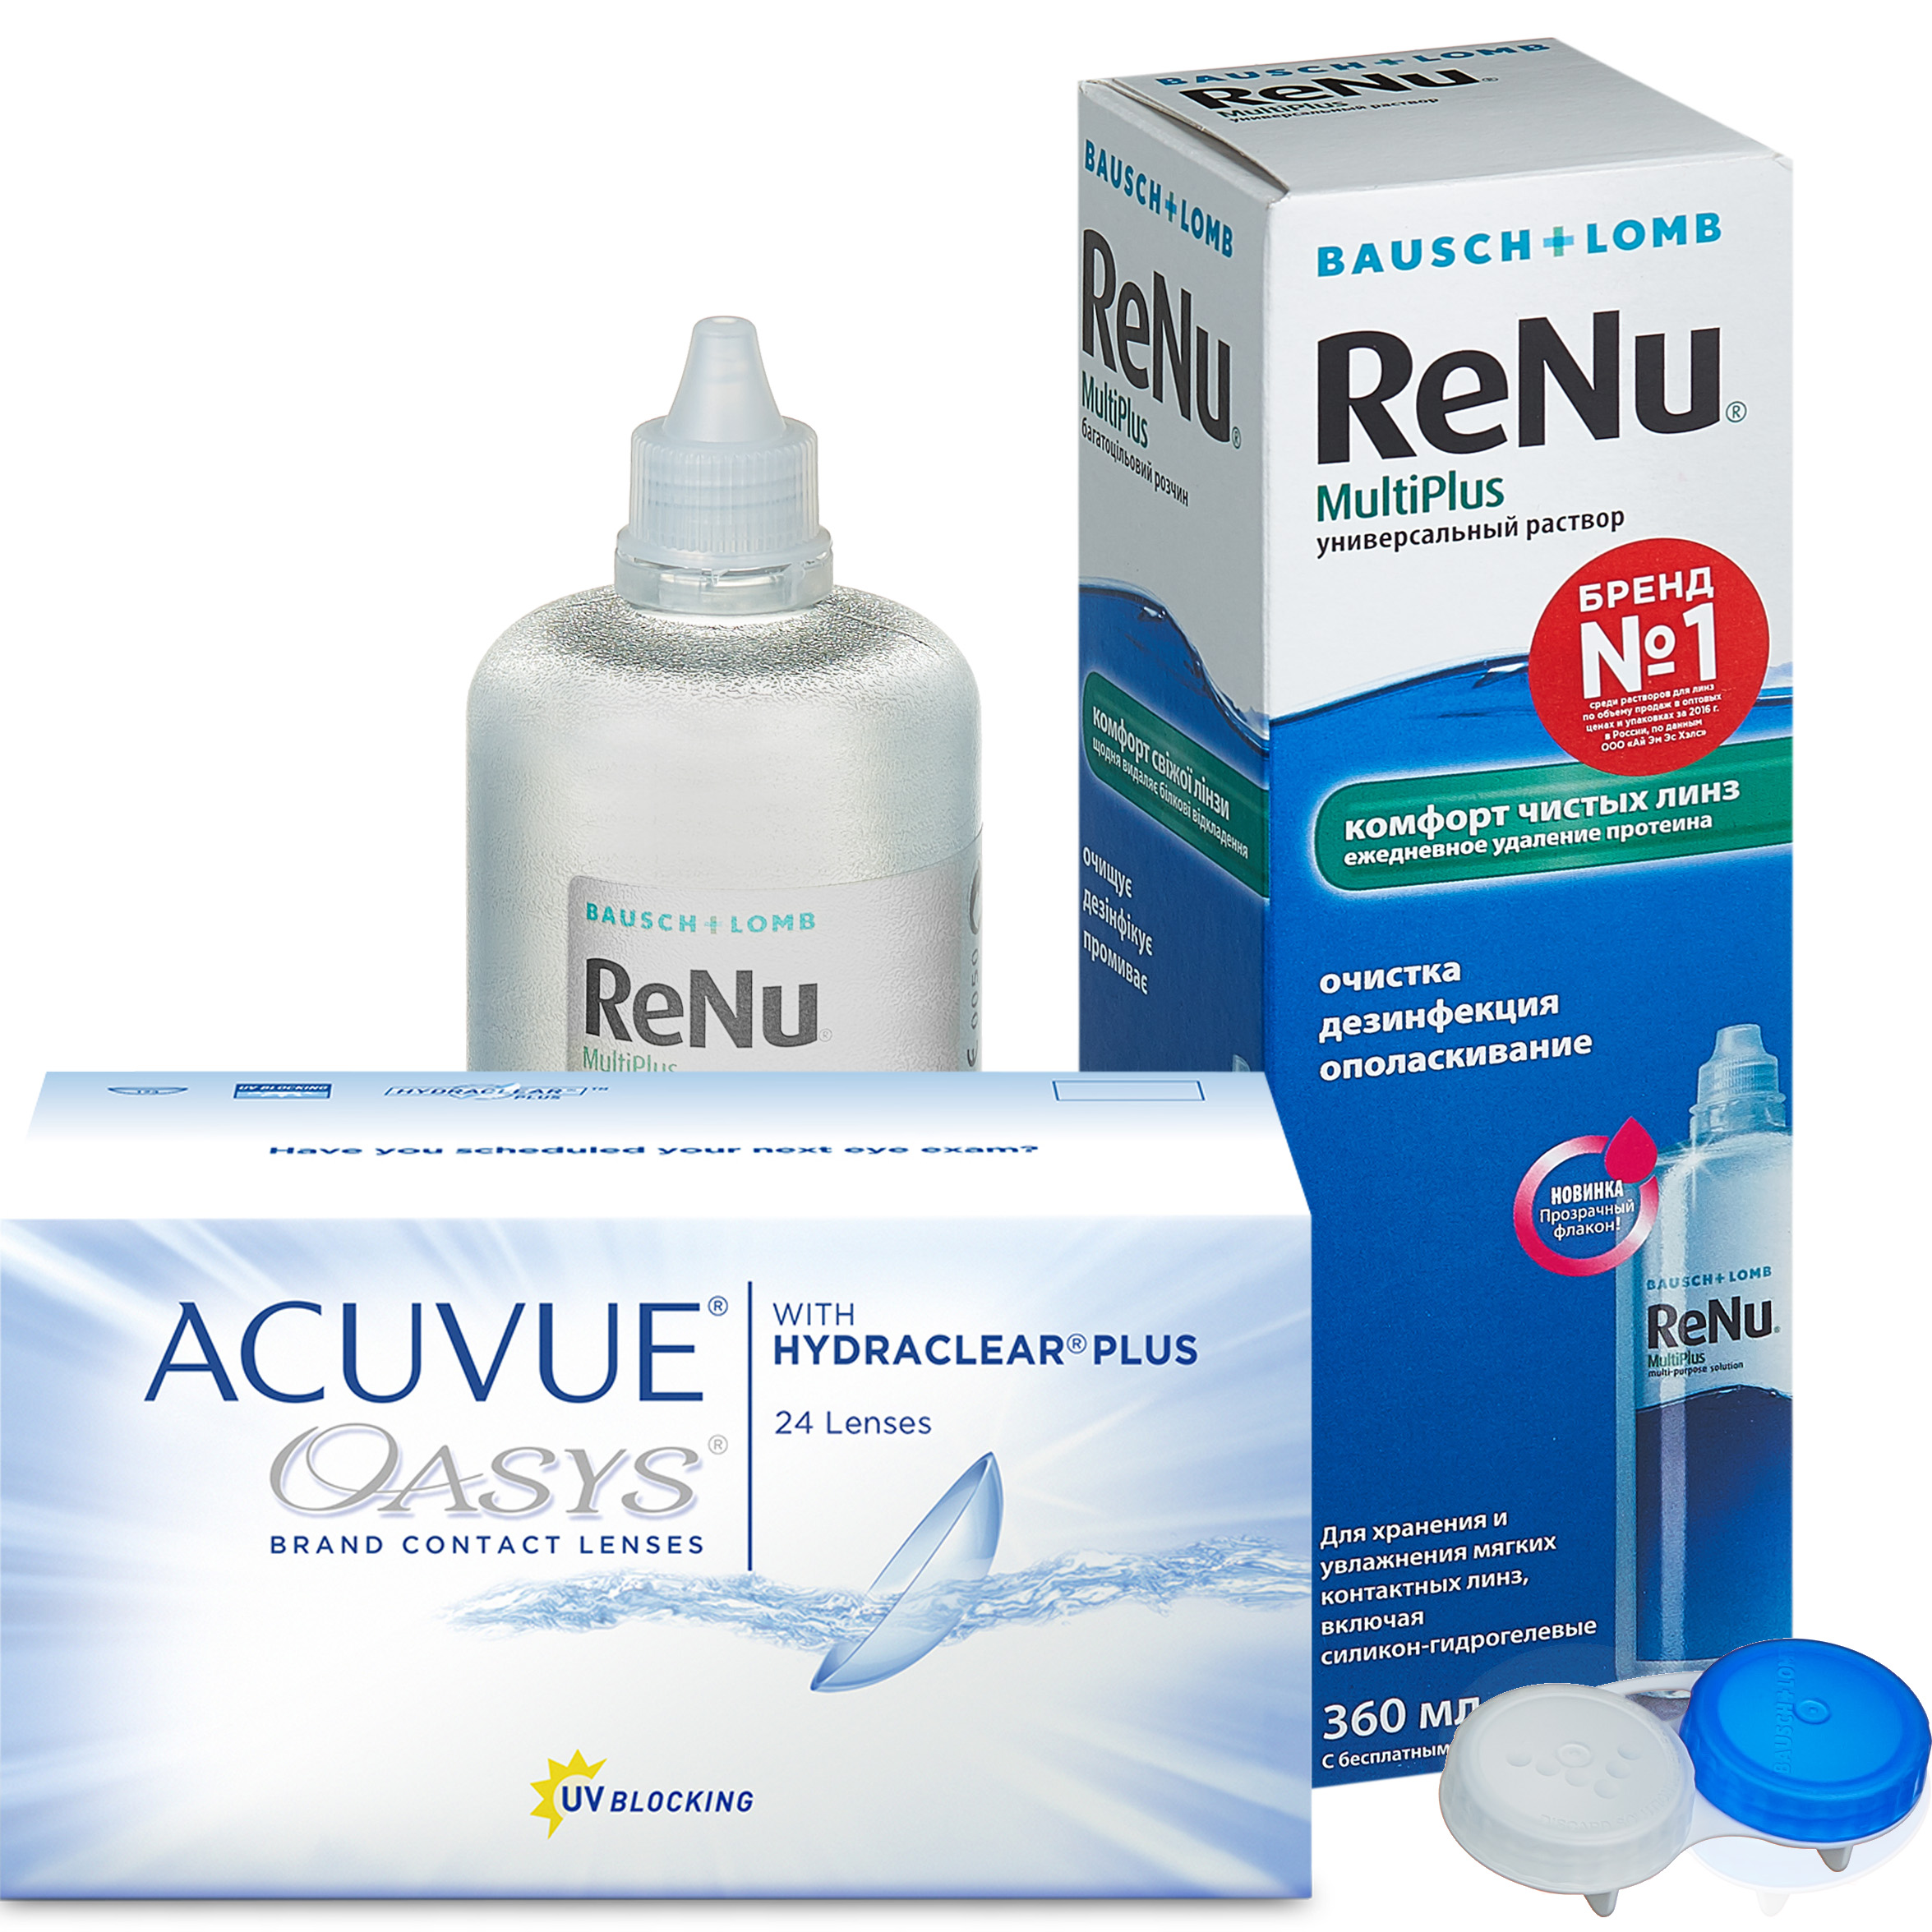 Купить Oasys with Hydraclear Plus 24 линзы + ReNu MultiPlus, Линзы Acuvue Oasys with Hydraclear Plus 24 линзы R 8.4 +5, 50 + ReNu Multi Plus 360 мл